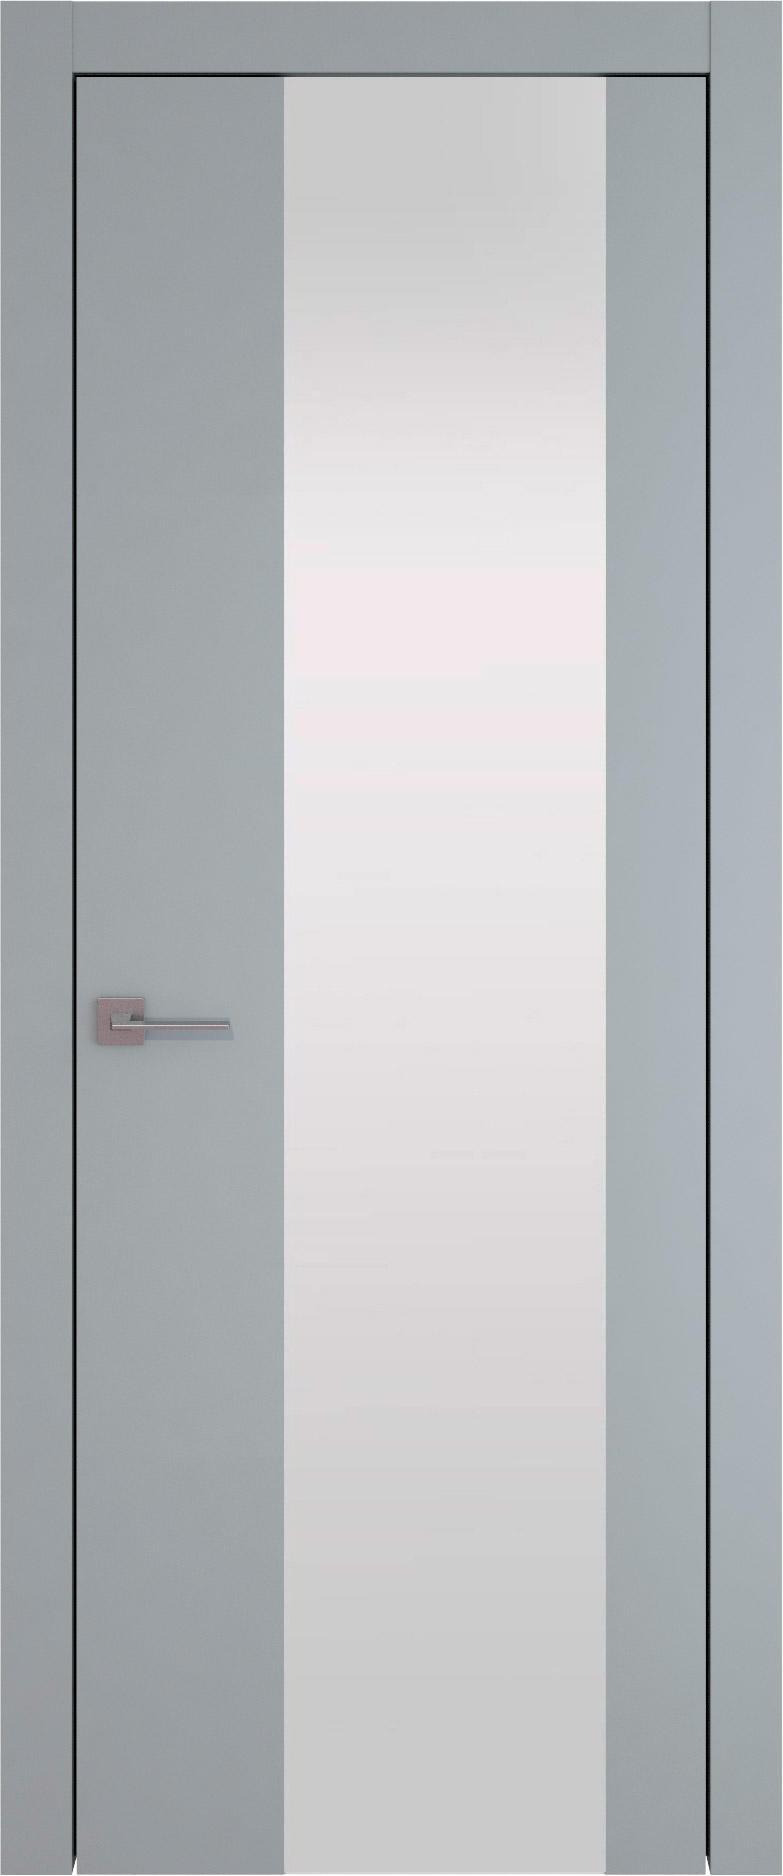 Tivoli Е-1 цвет - Серебристо-серая эмаль (RAL 7045) Со стеклом (ДО)